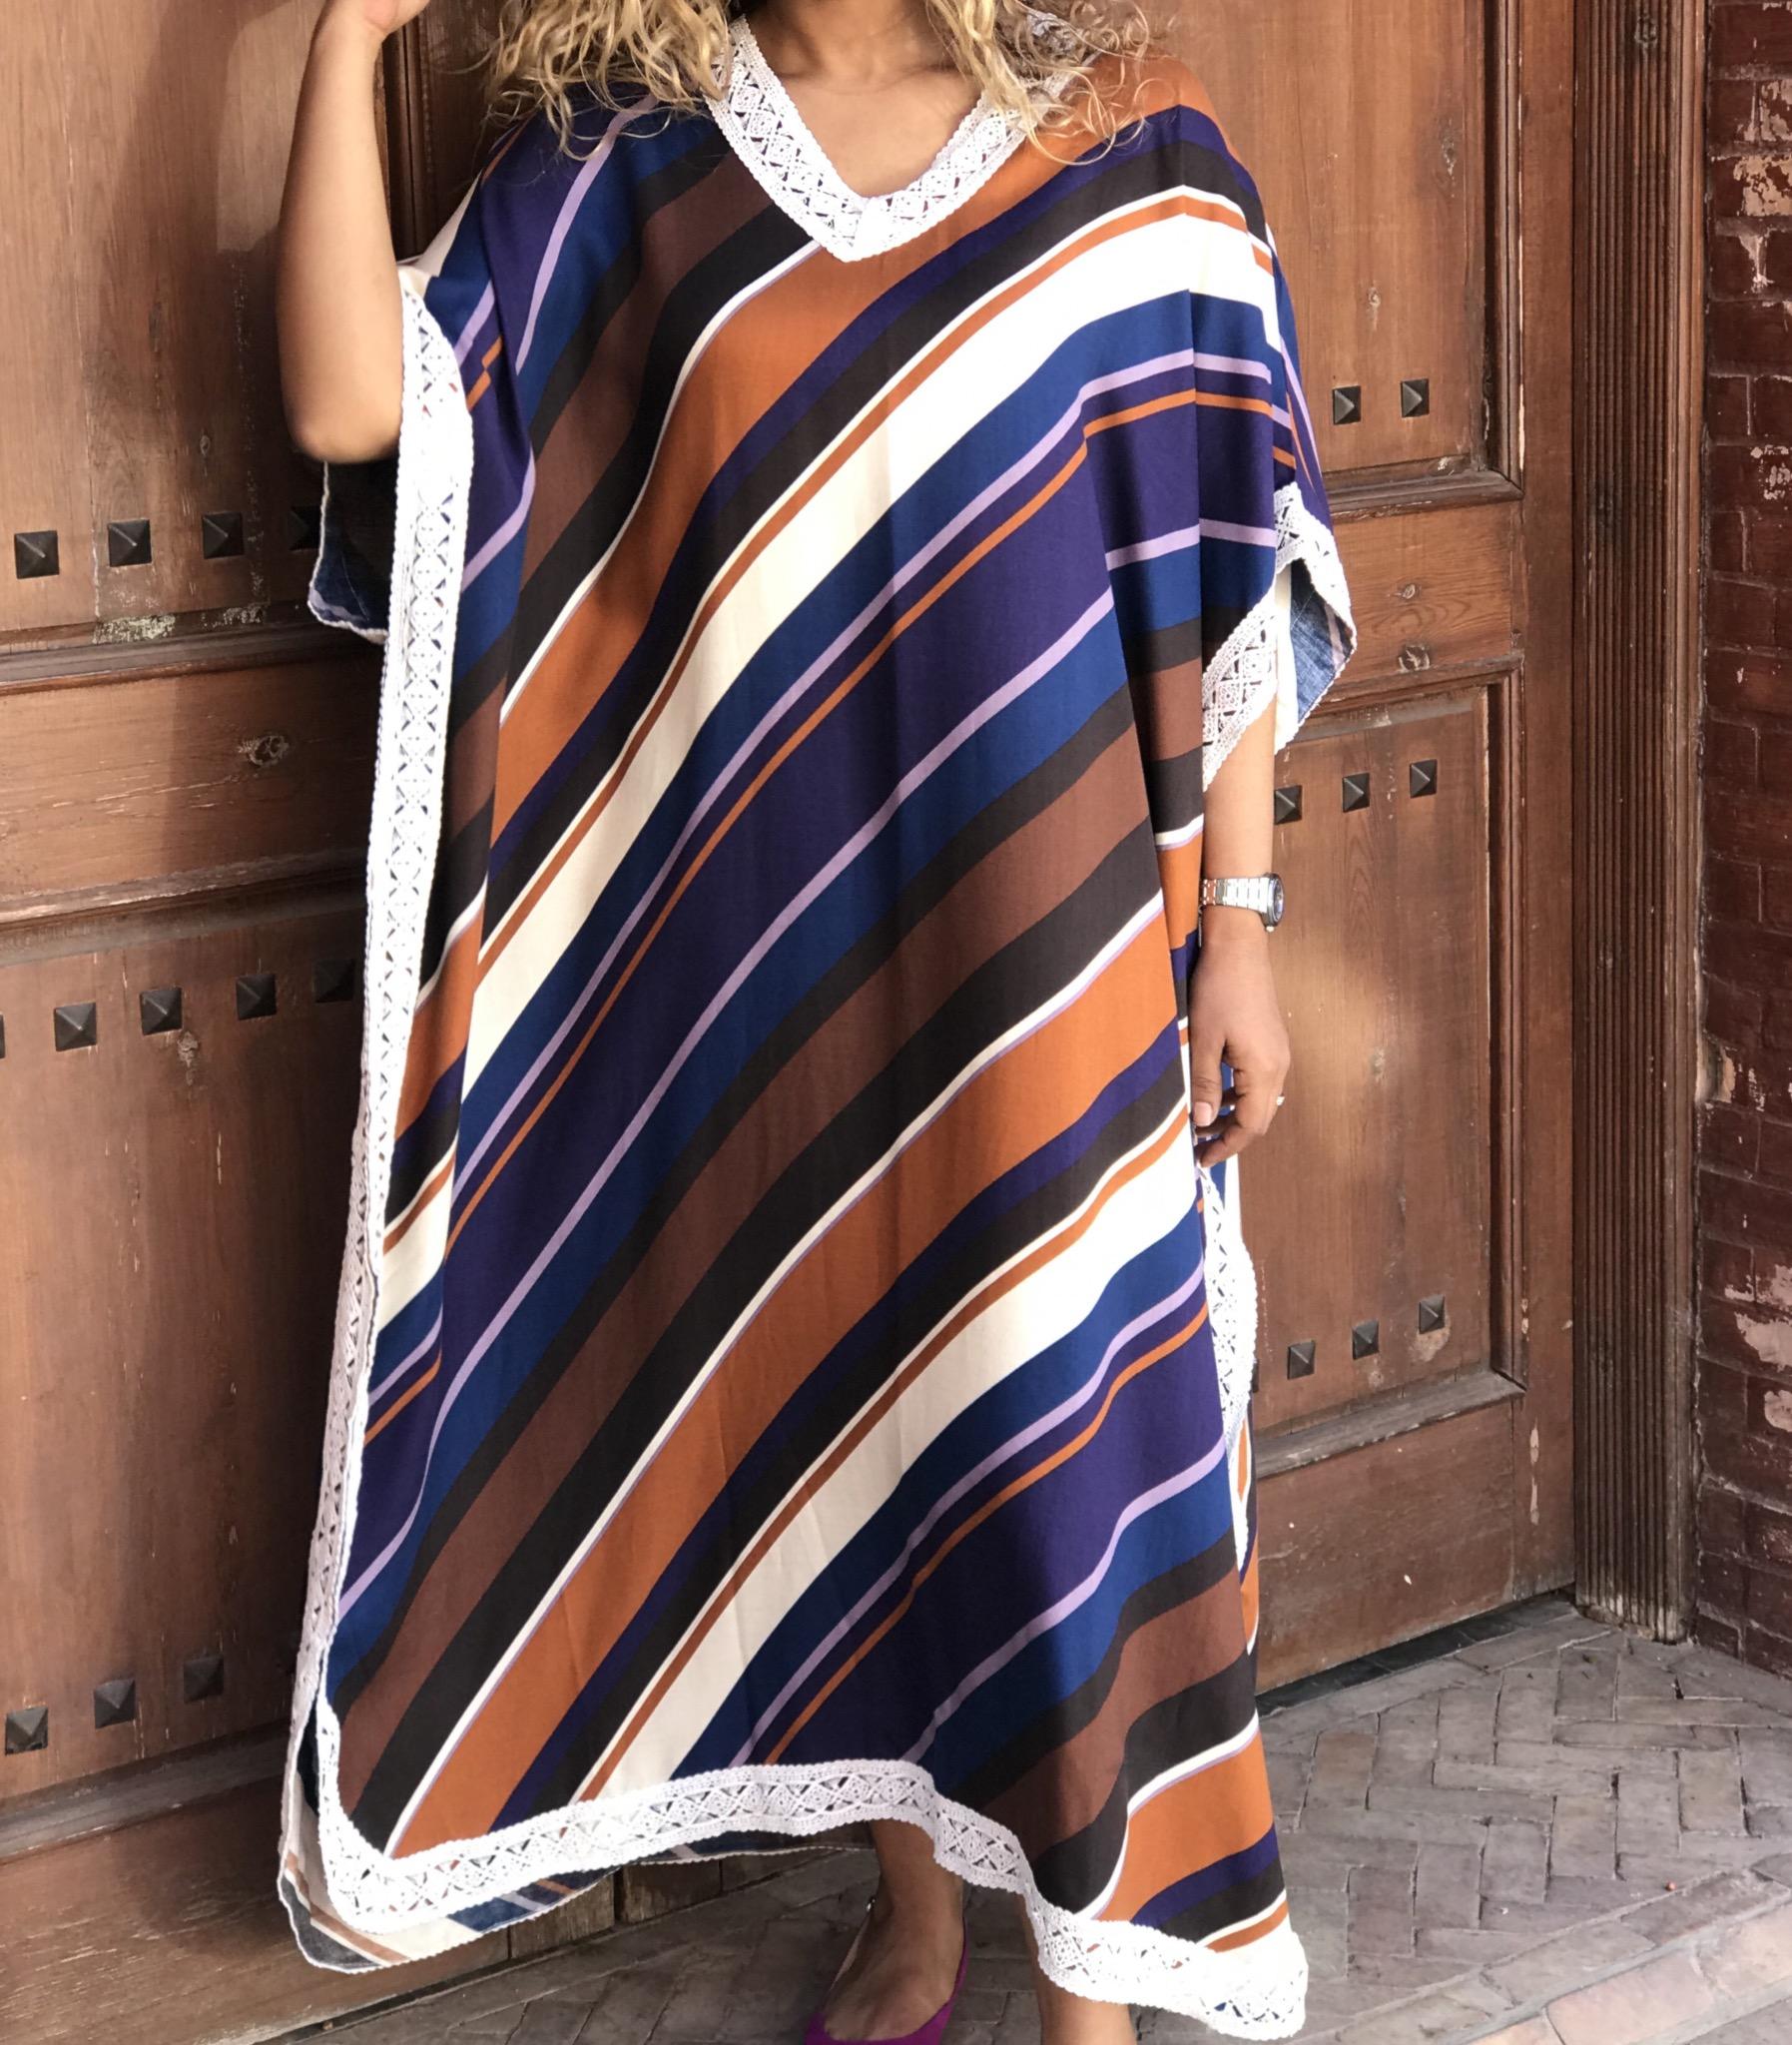 Gandoura coton purple camel blue with white lace